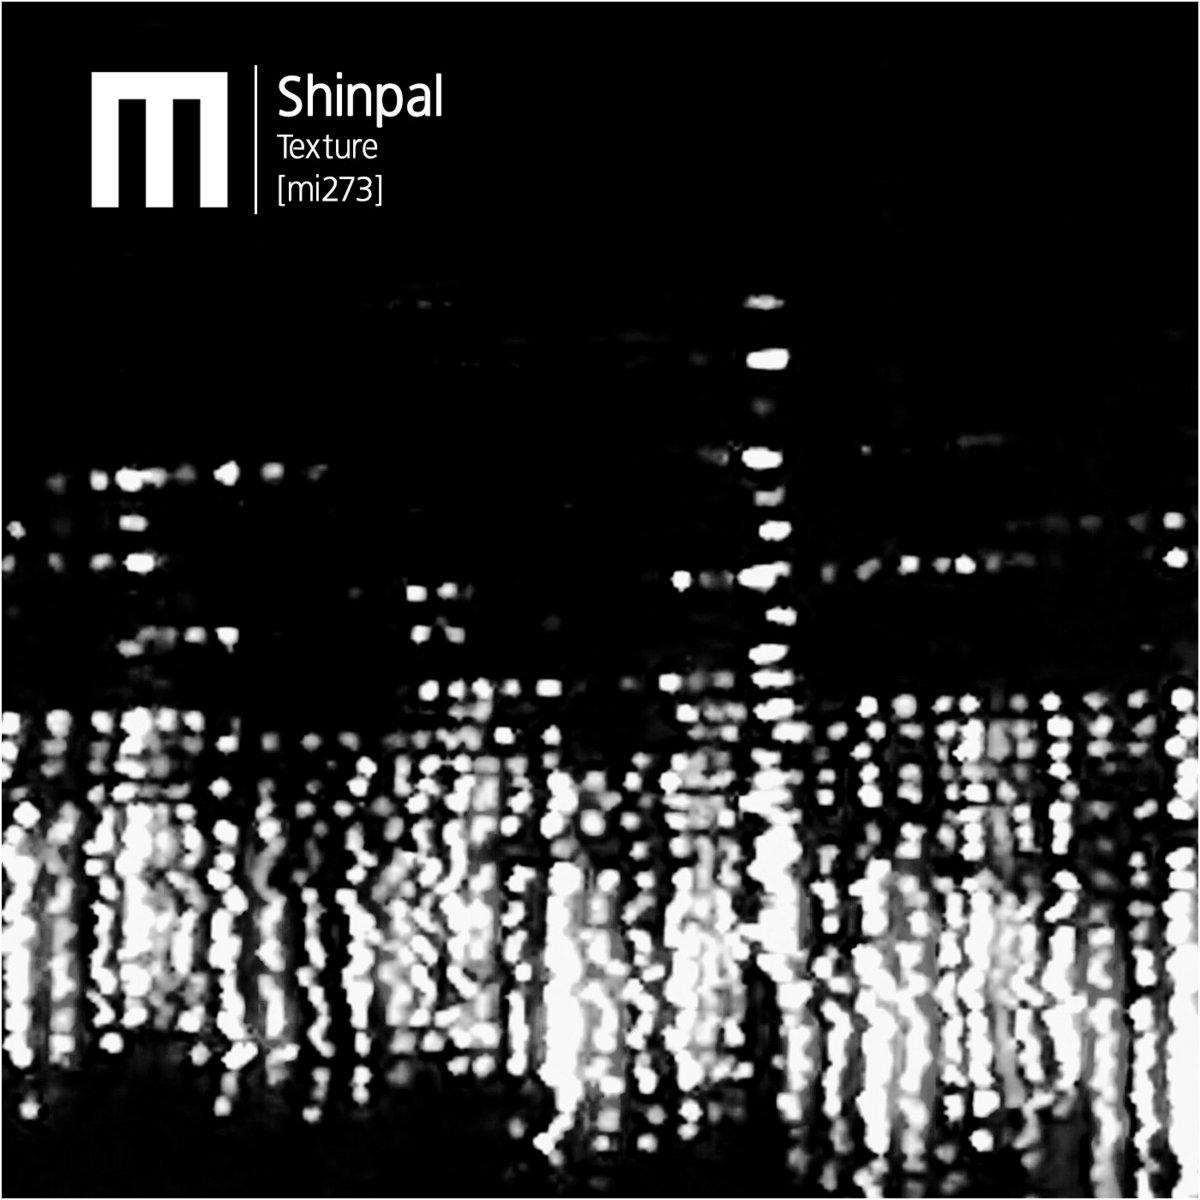 Shinpal – Texture